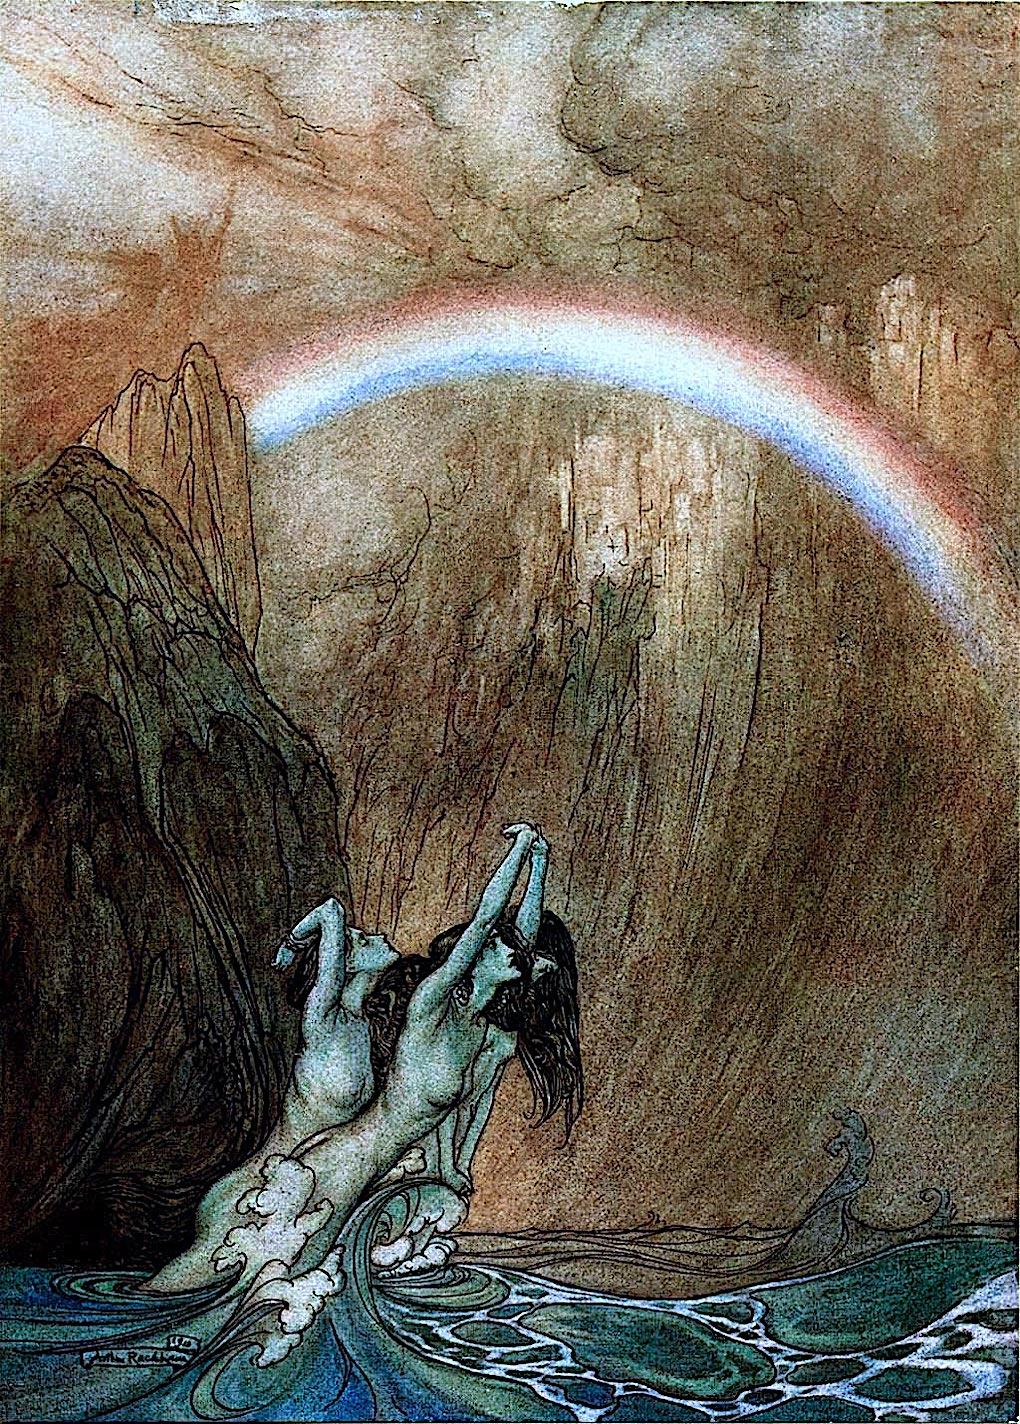 an Arthur Rackham illustration of mermaids